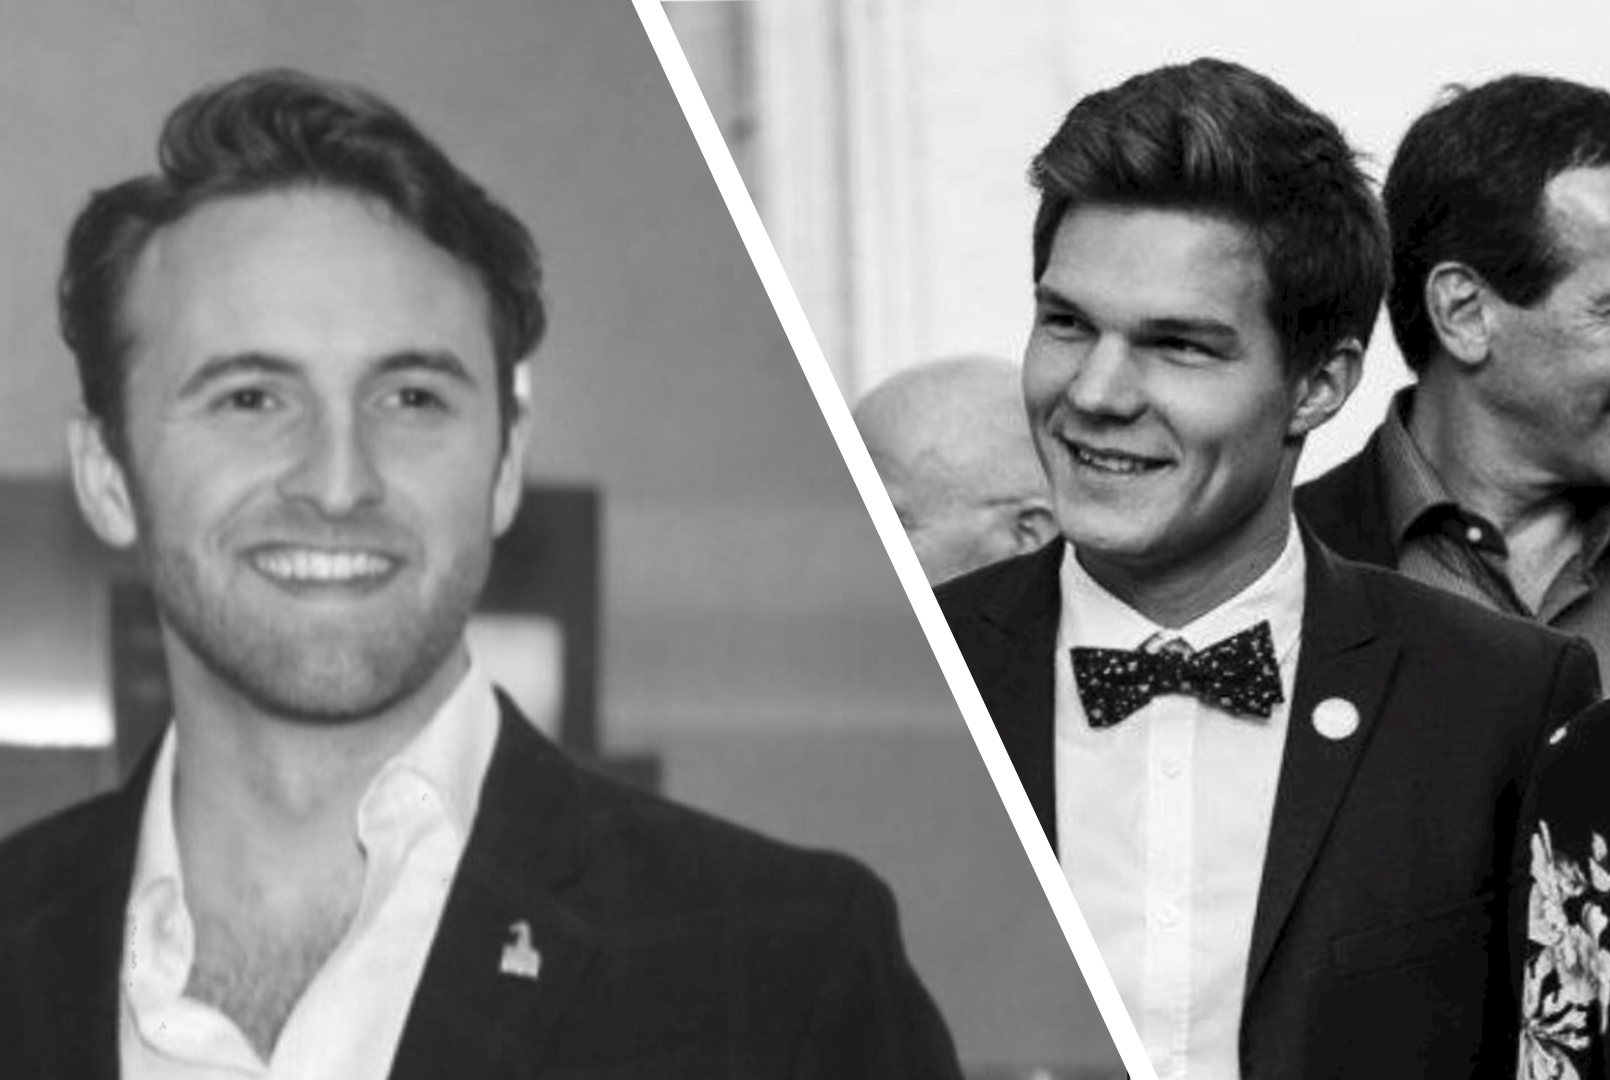 Braeckman and Douglas Laing - Meug Tastingfestival 2020